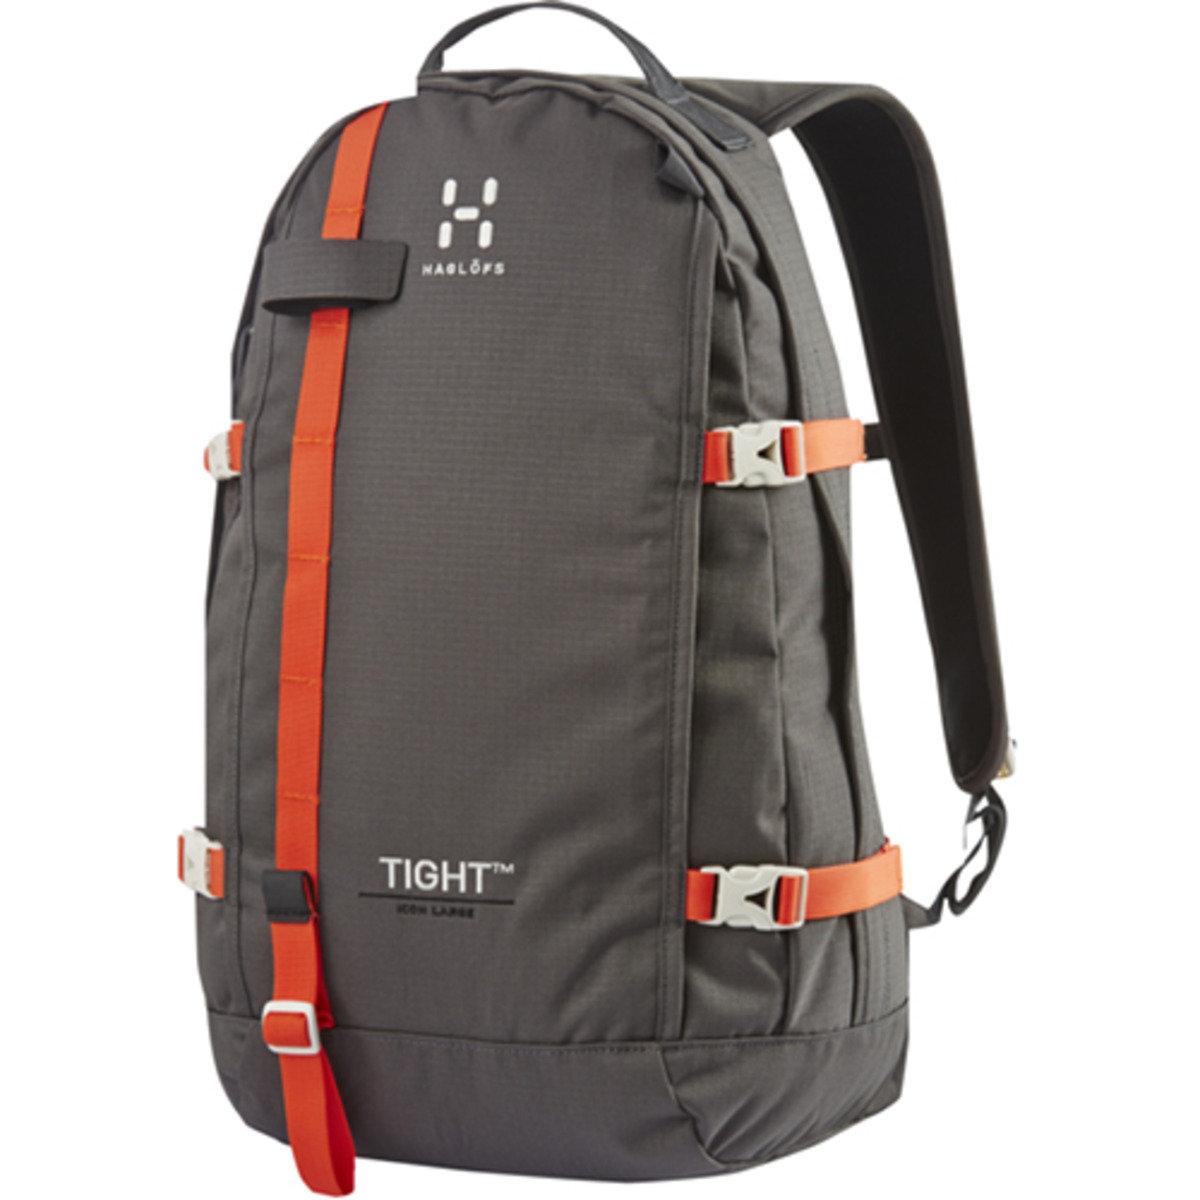 Tight Icon Large -  時尚的輕便背包